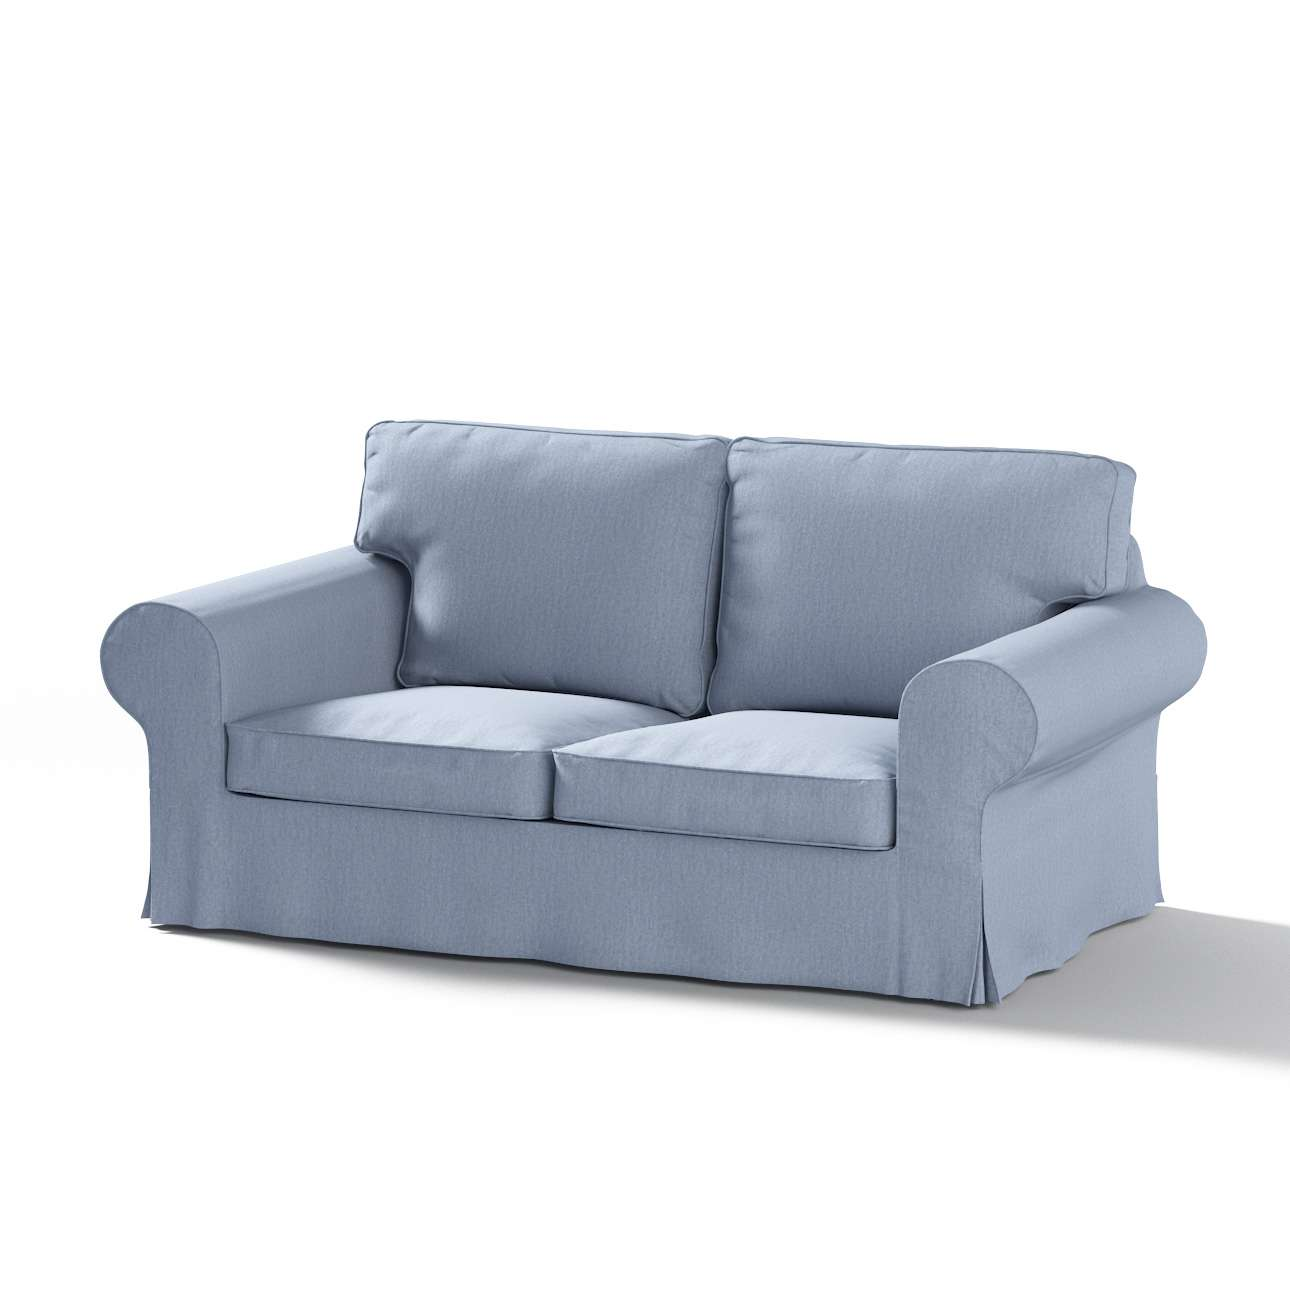 Ektorp 2 sæder sovesofa gammel model<br/>Bredde ca 195cm fra kollektionen Chenille, Stof: 702-13